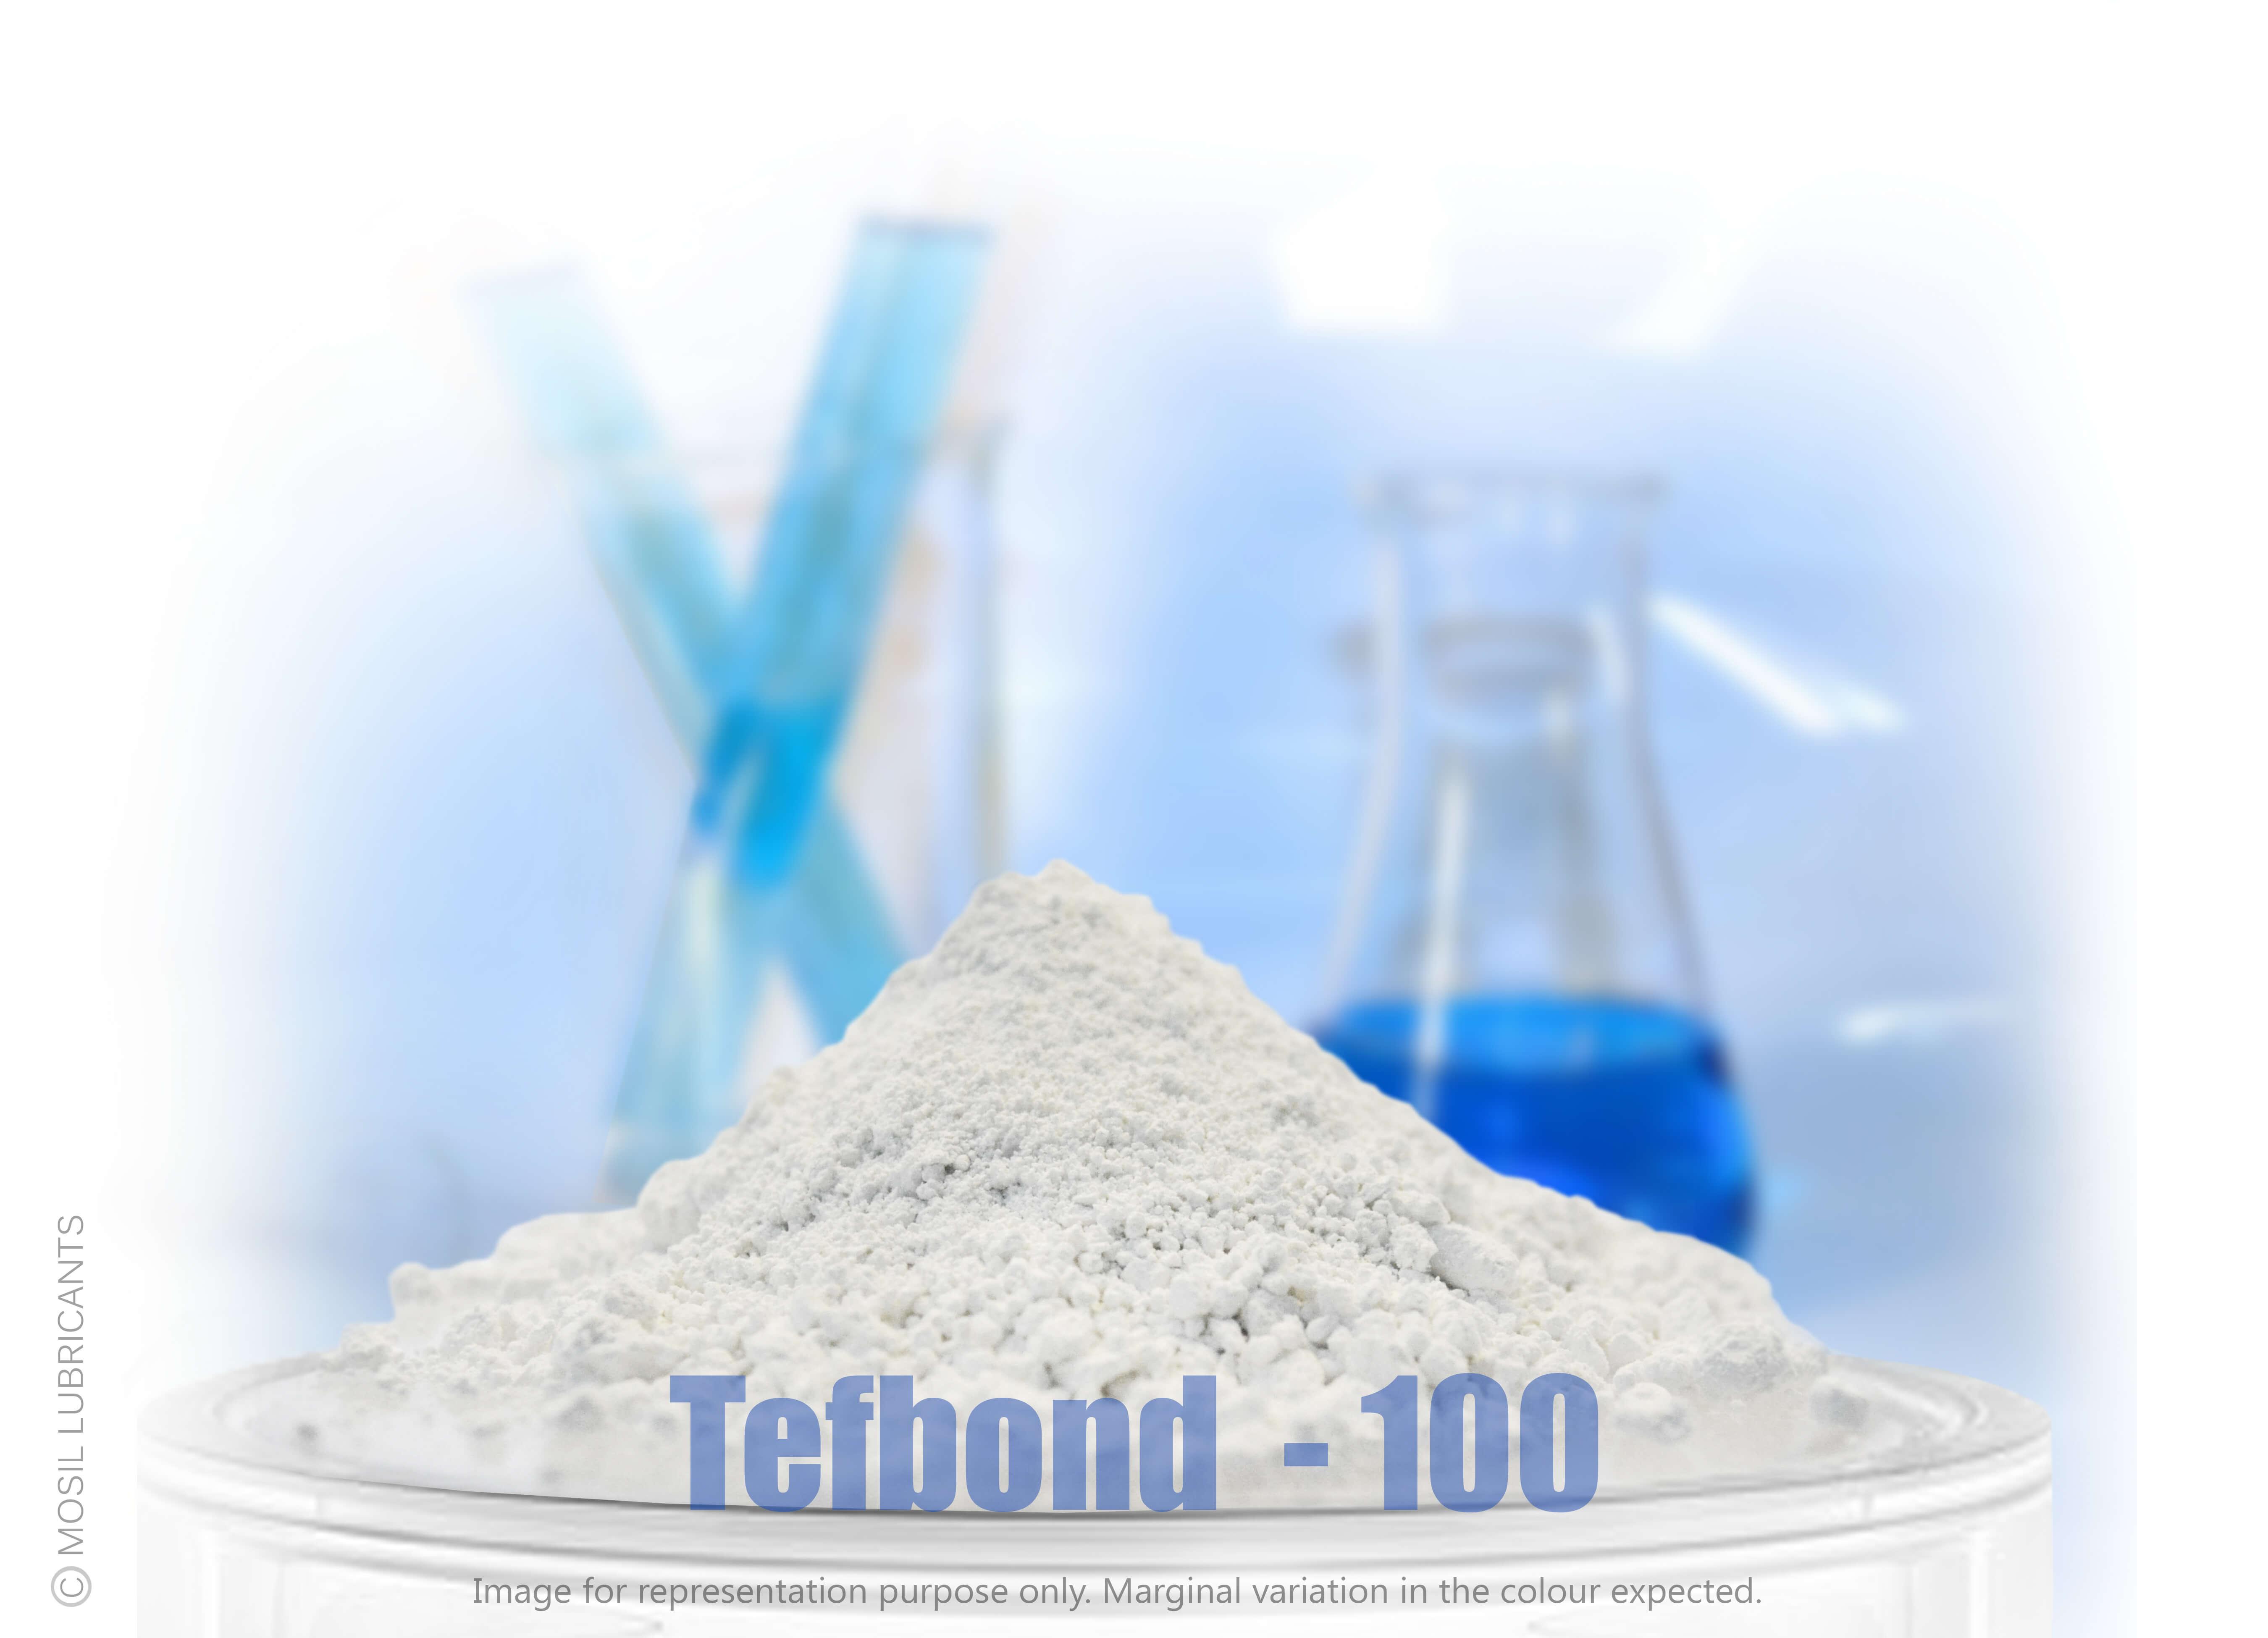 TEFBOND - 100 | Bonded Lubricant